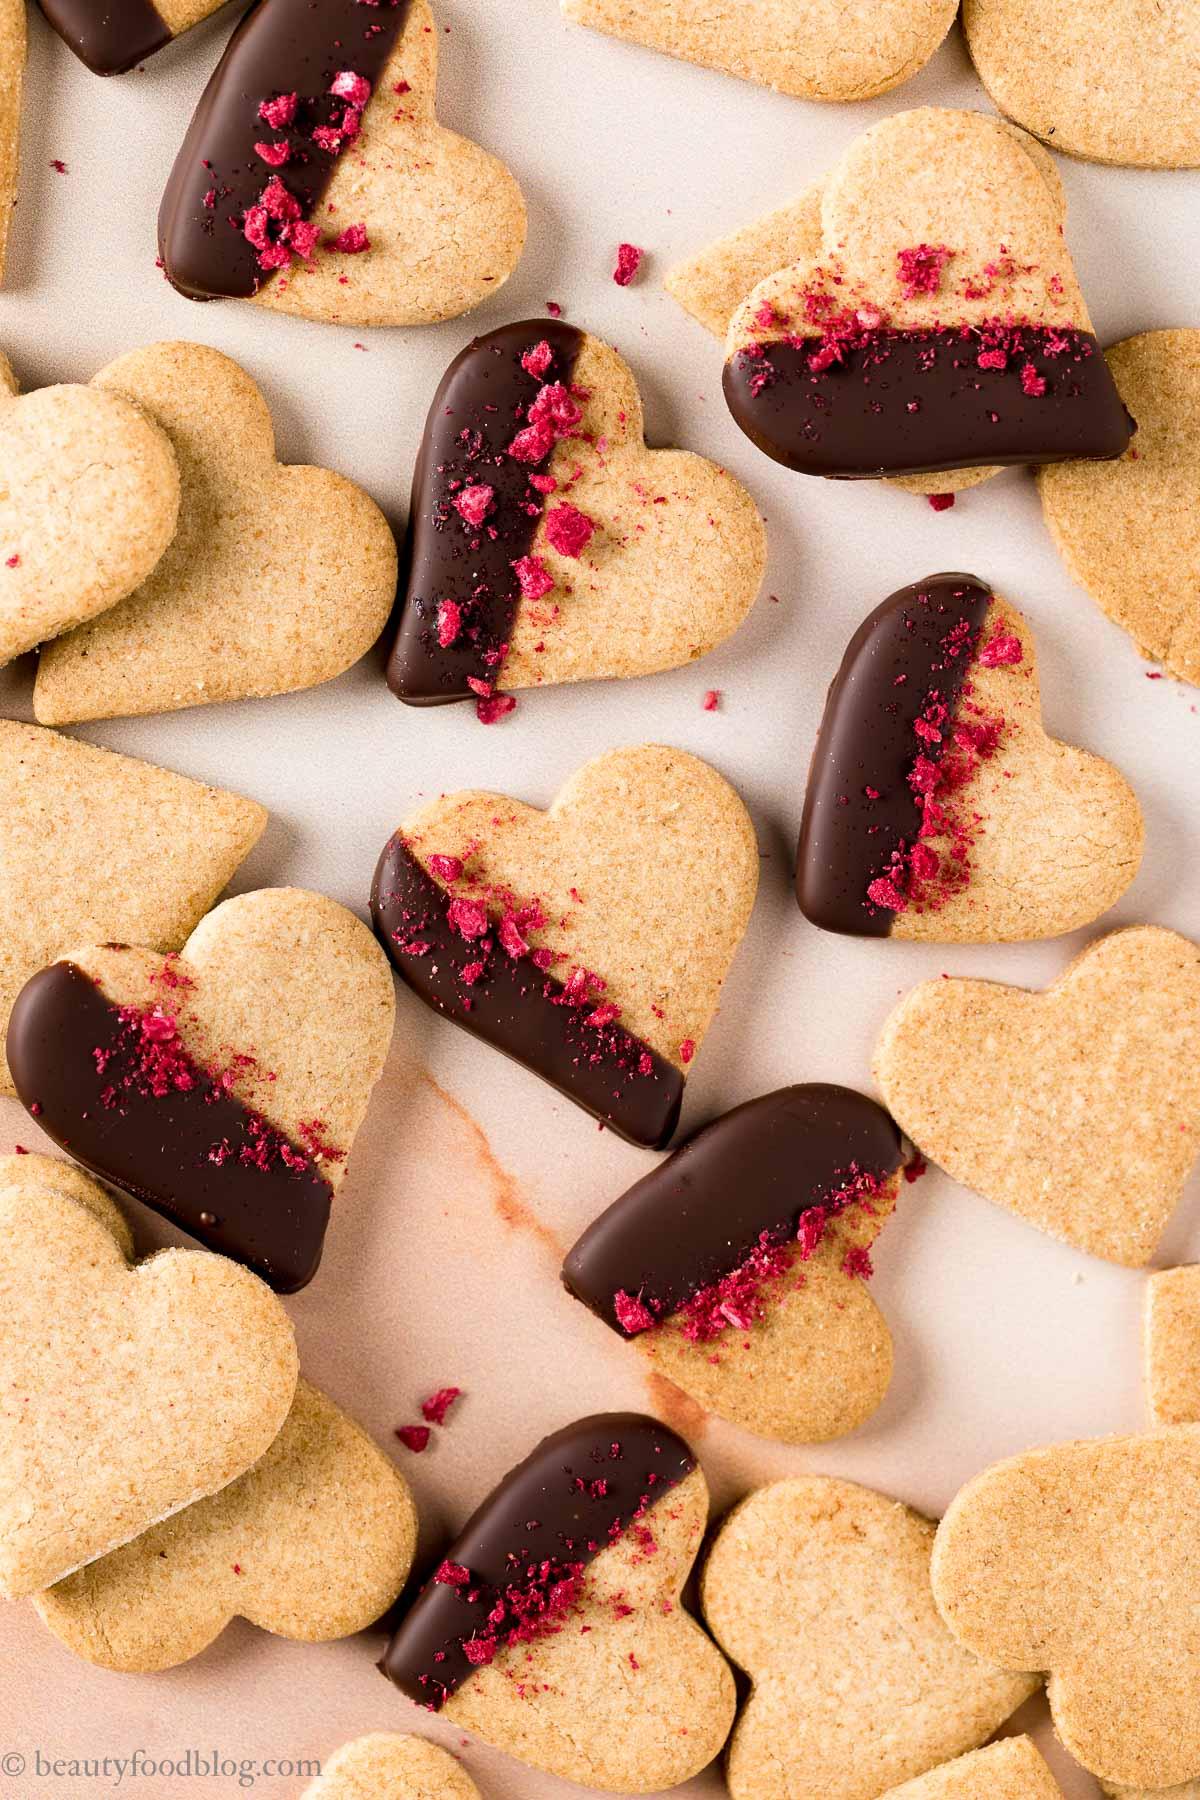 vegan Valentines Day vegan shortbread cookies ricetta biscotti di pasta frolla vegana integrale senza uova senza burro per San Valentino frollini vegani